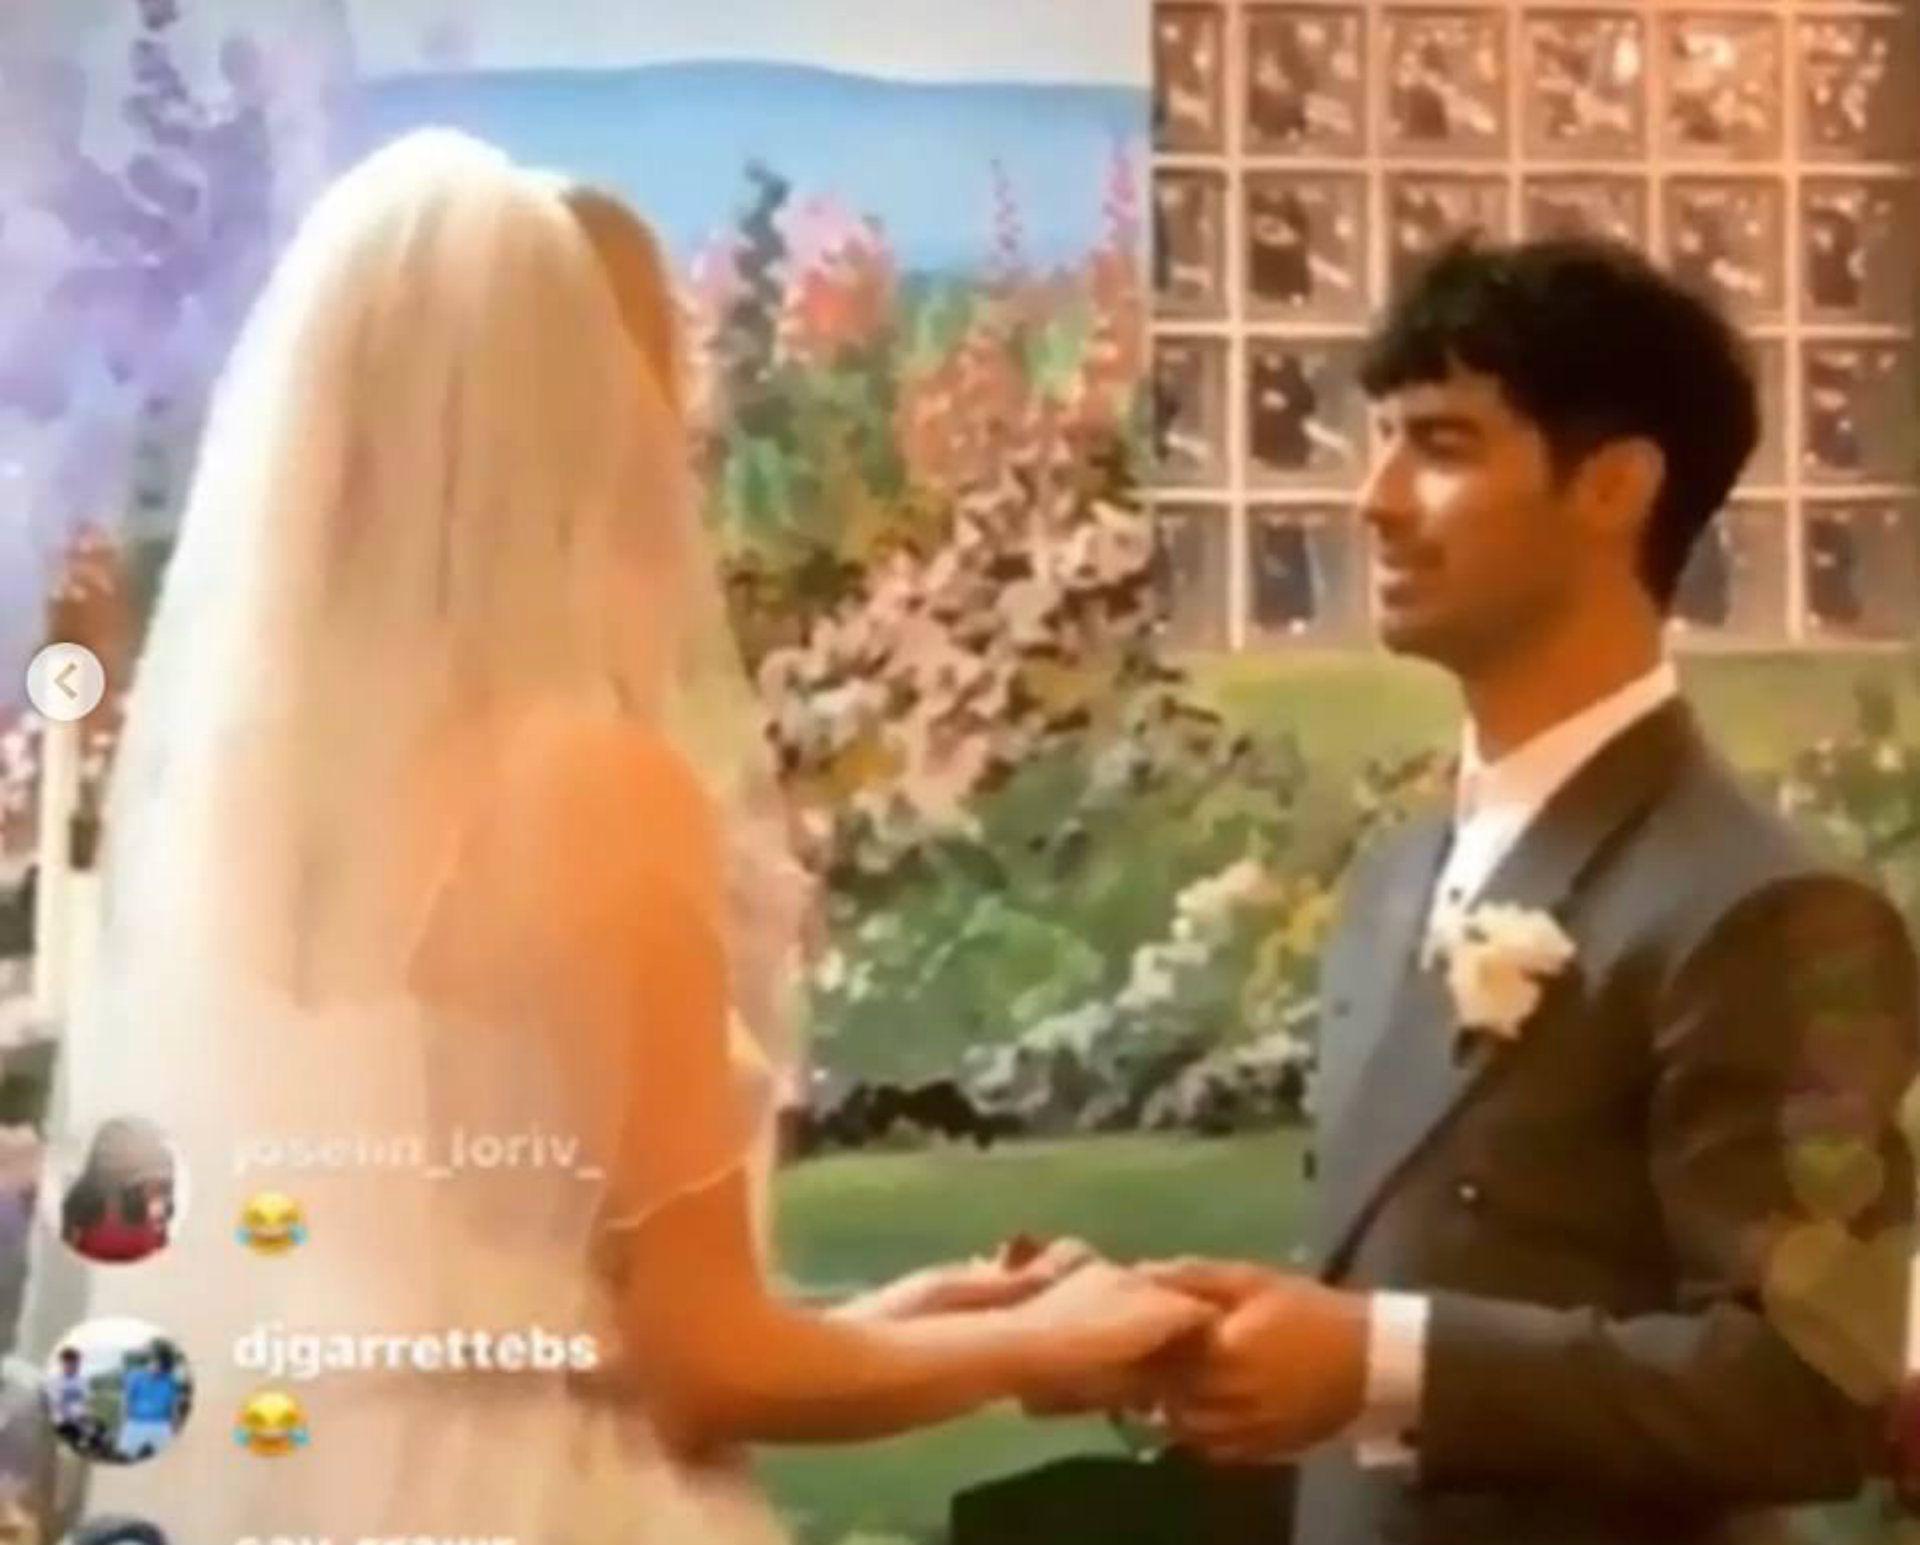 Joe Jonas y Sophie Turner sorprendieron al casarse en Las Vegas( Foto: Instagram)